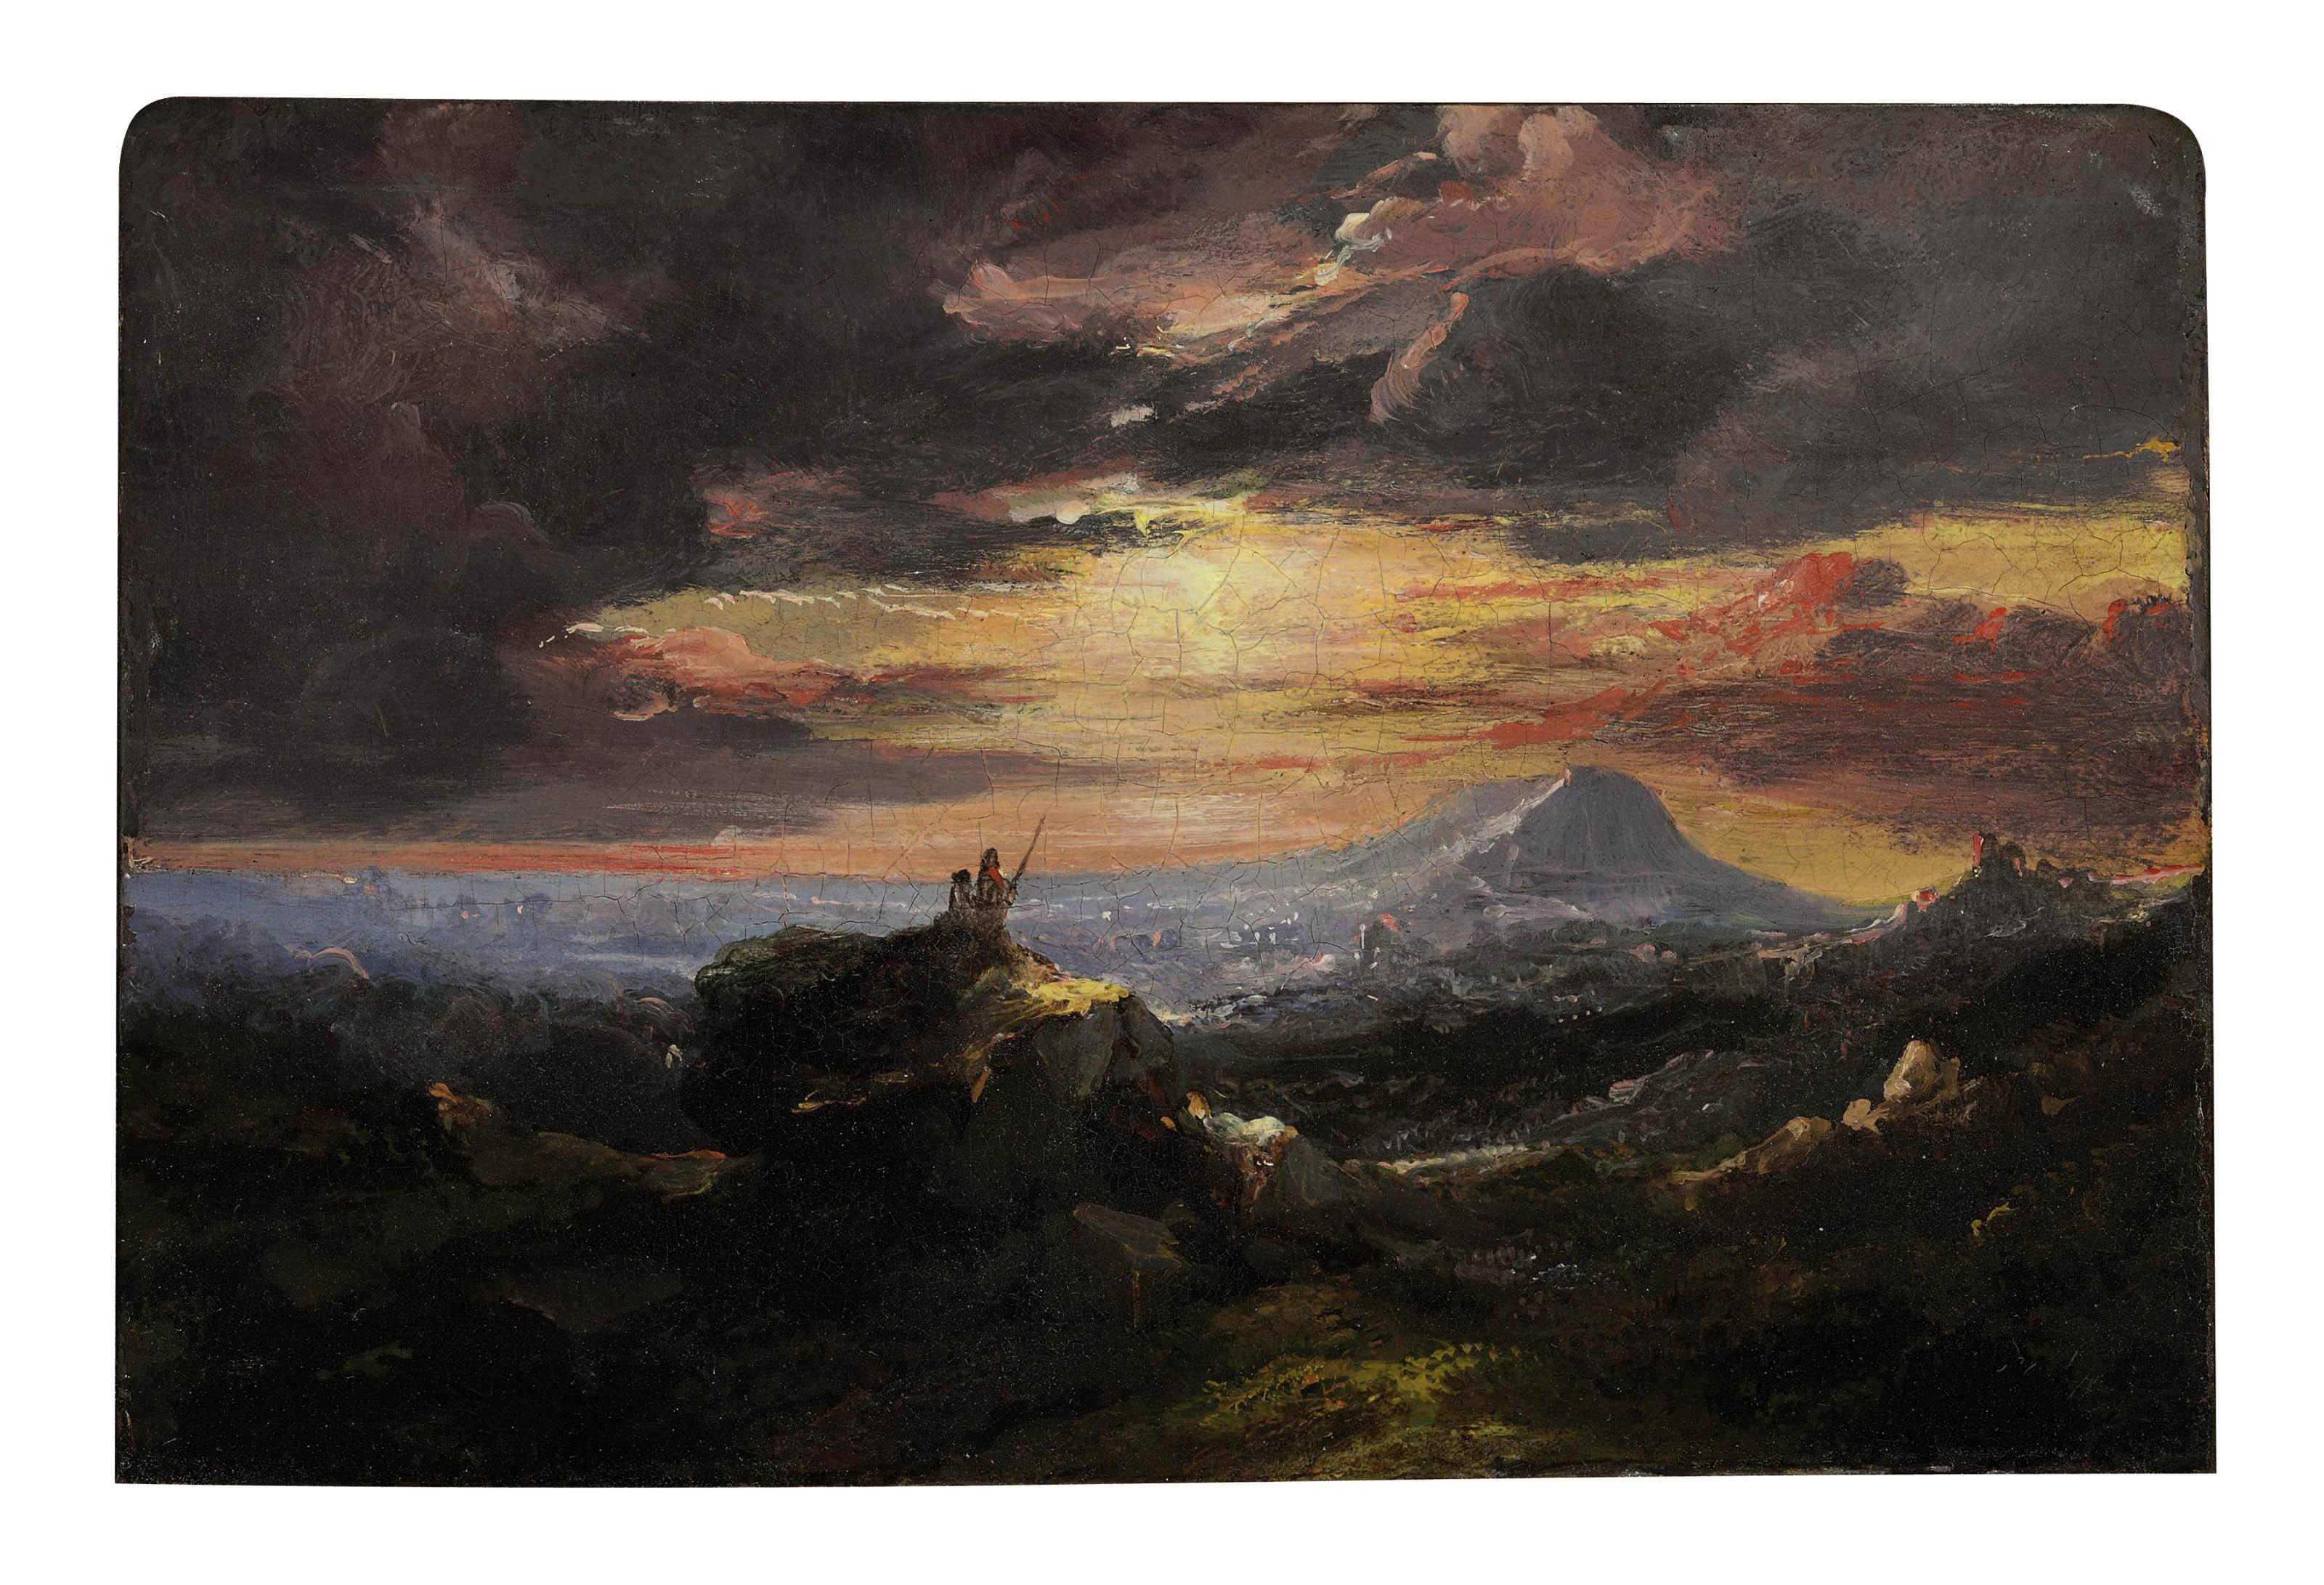 Mountainous landscape at sunset